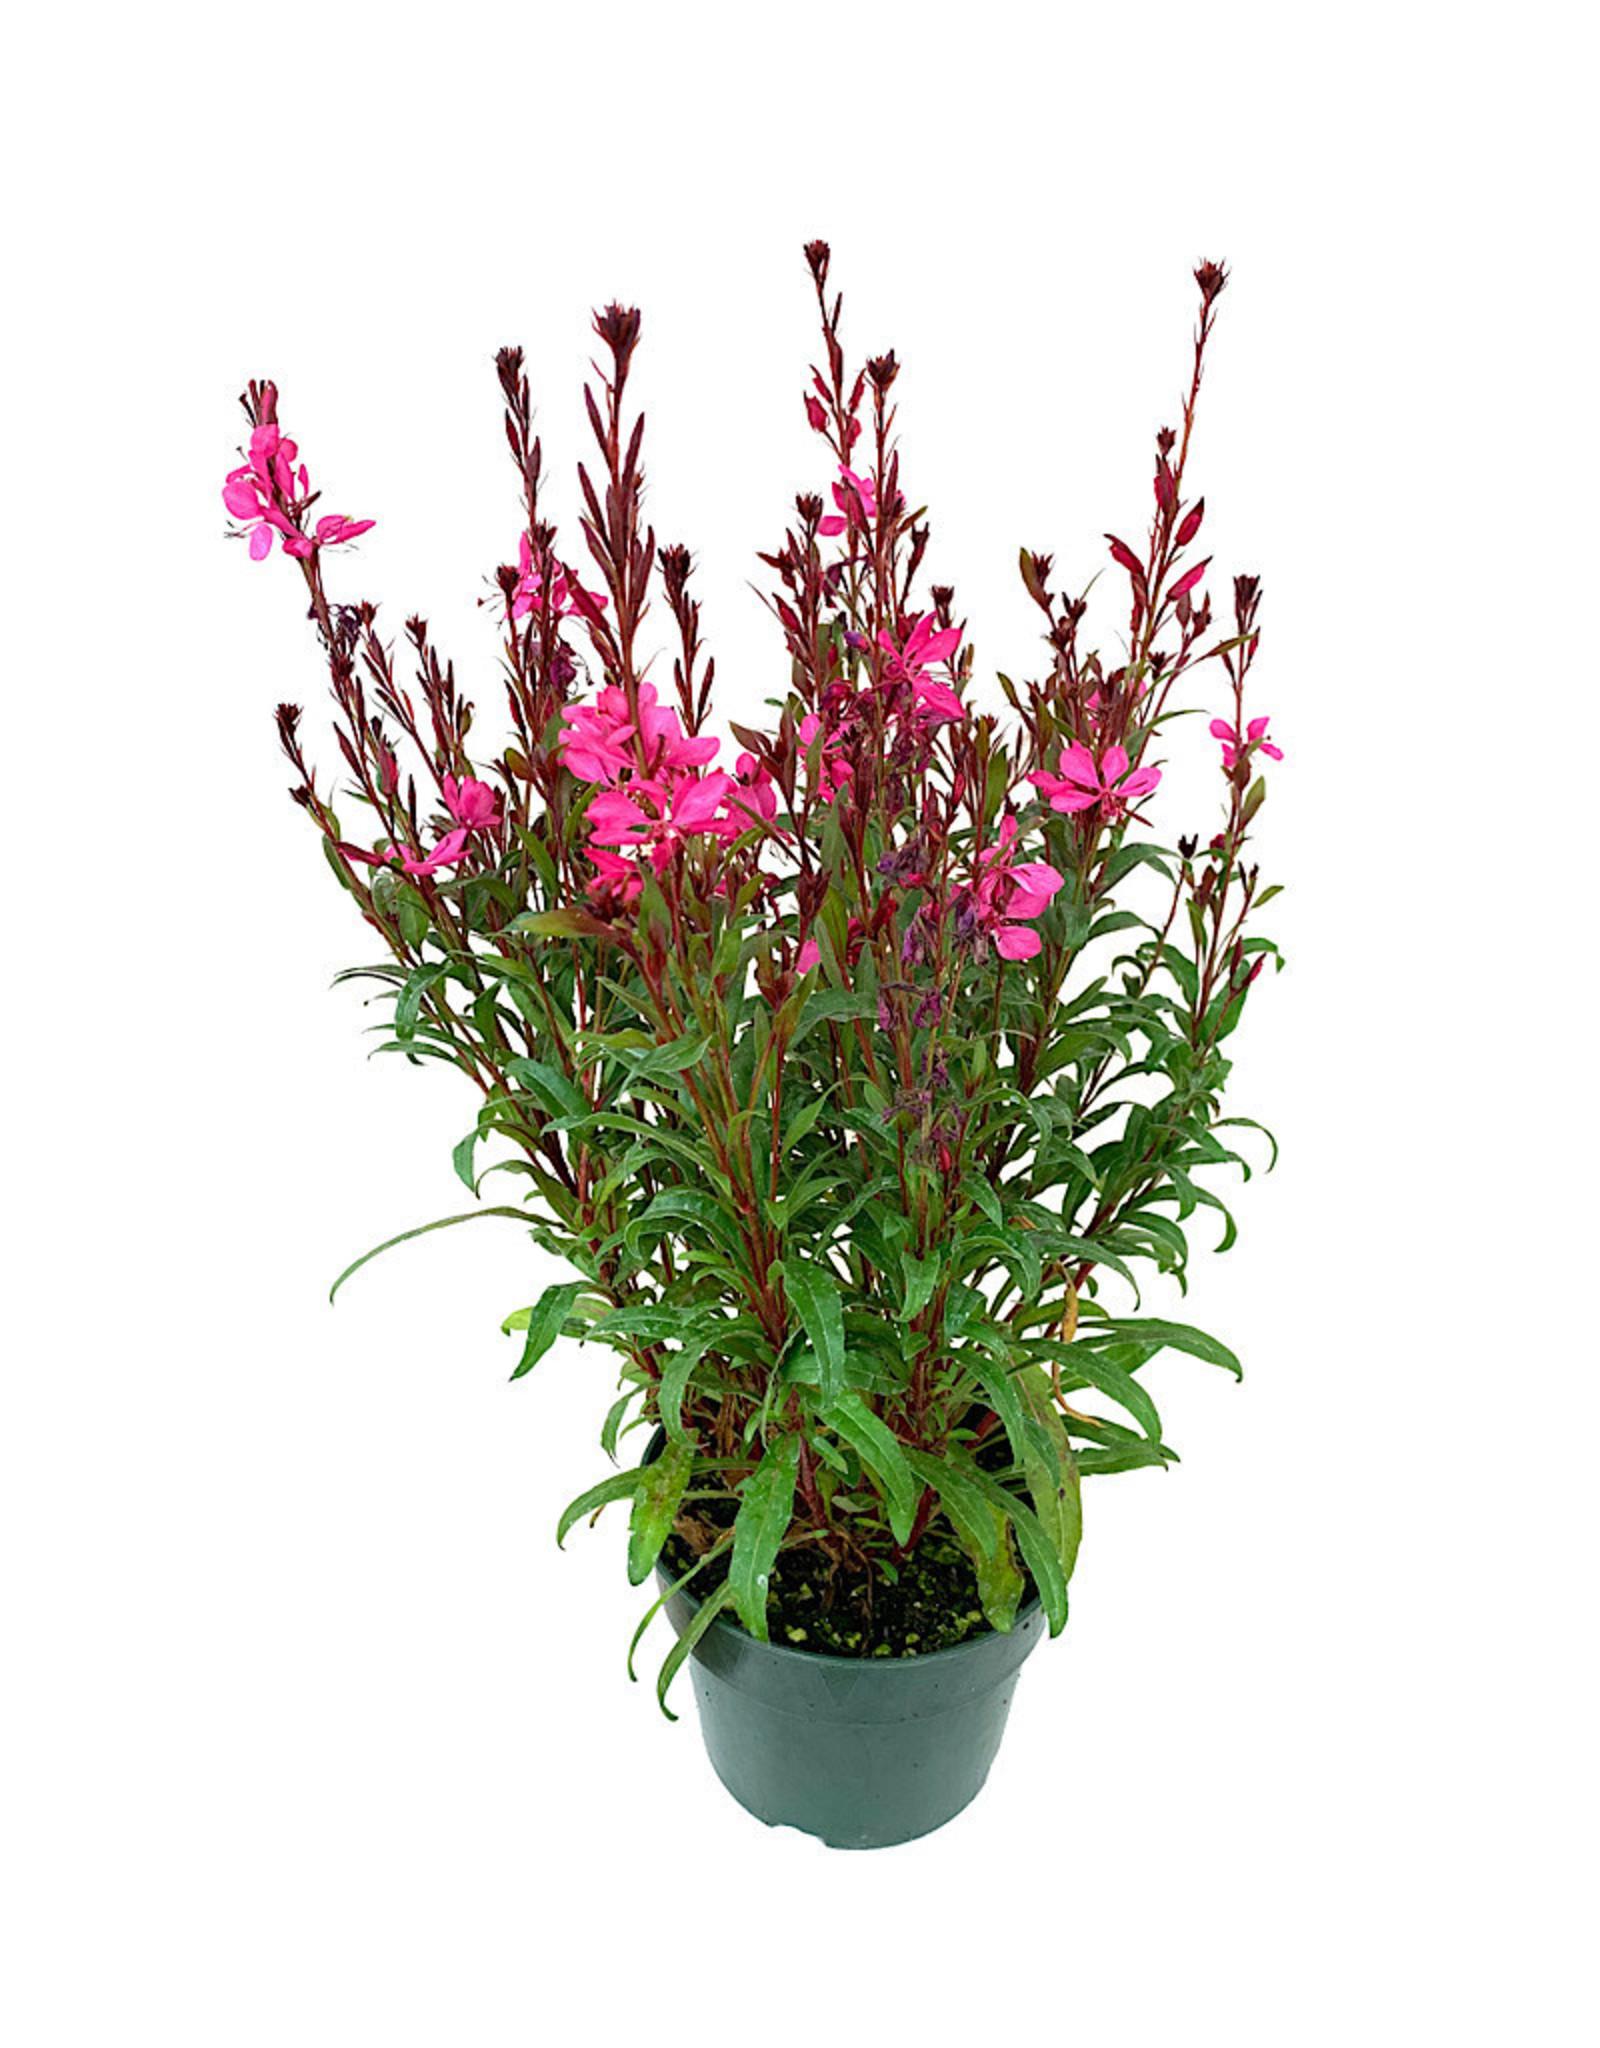 Gaura 'Belleza Compact Light Pink' 6 Inch